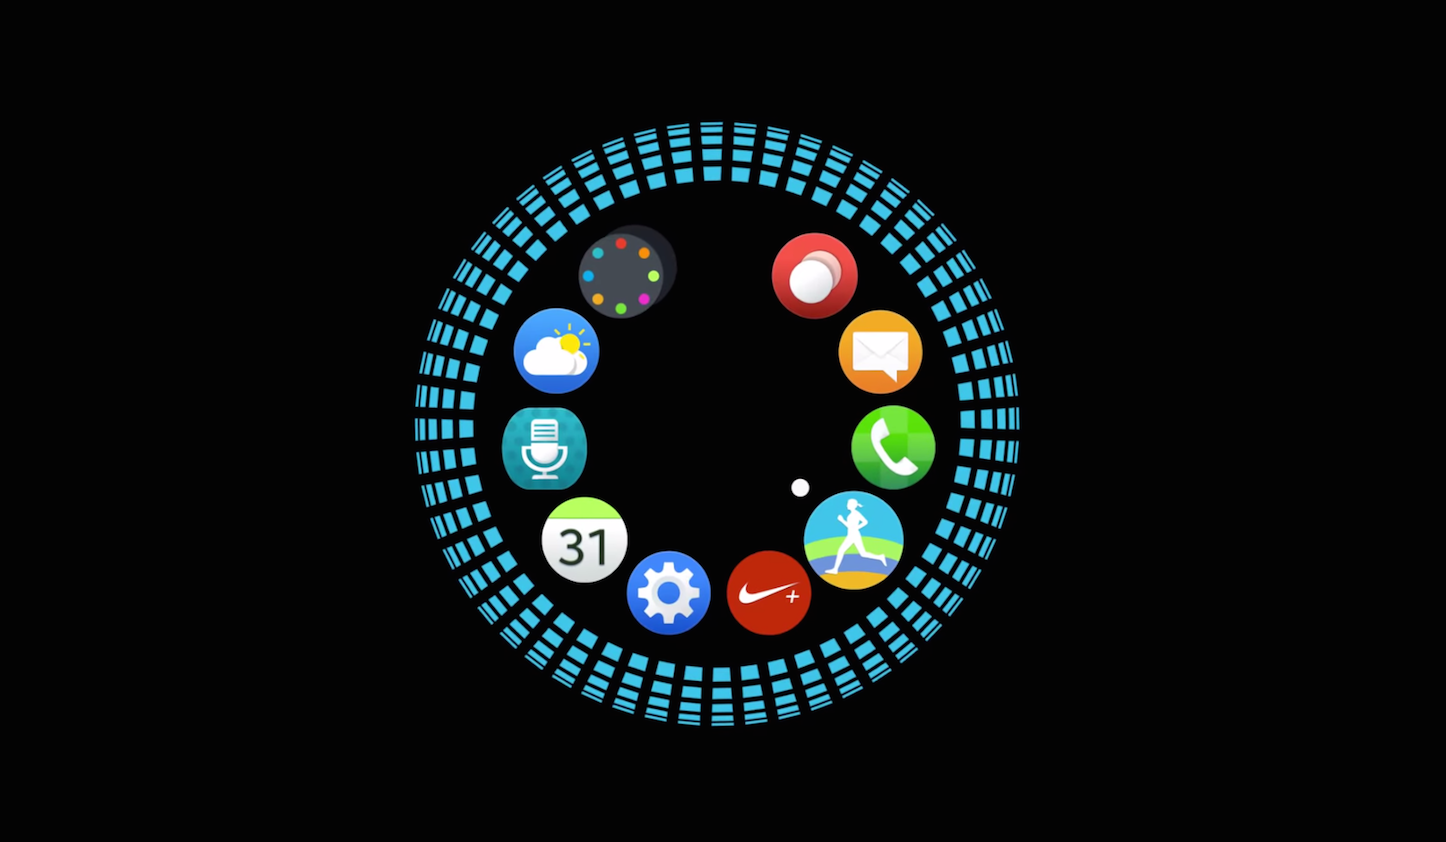 Full screen usage